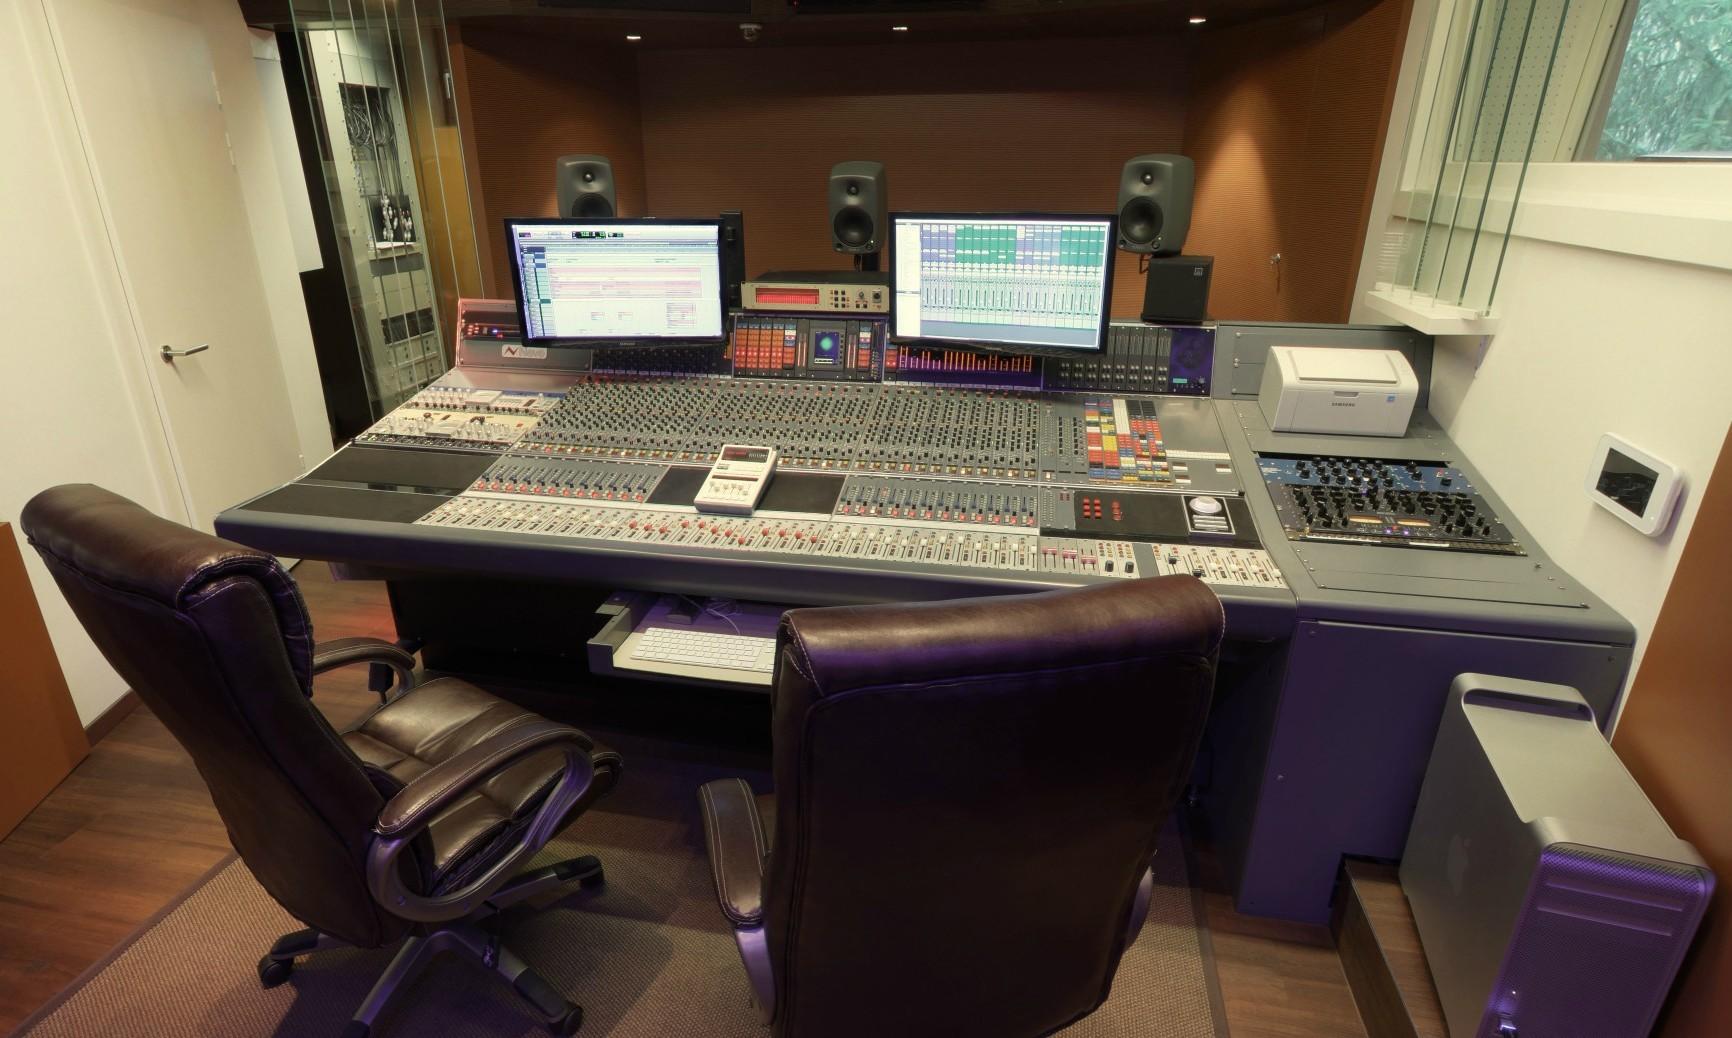 Tonstudios Tirol - Musik-produktion Österreich - Aktiv Sound Records - Neve Konsole V66 - Manley Mastering - Neumann Mikrofon Österreich - Brauner VM1 - AKG C12 - Österreich